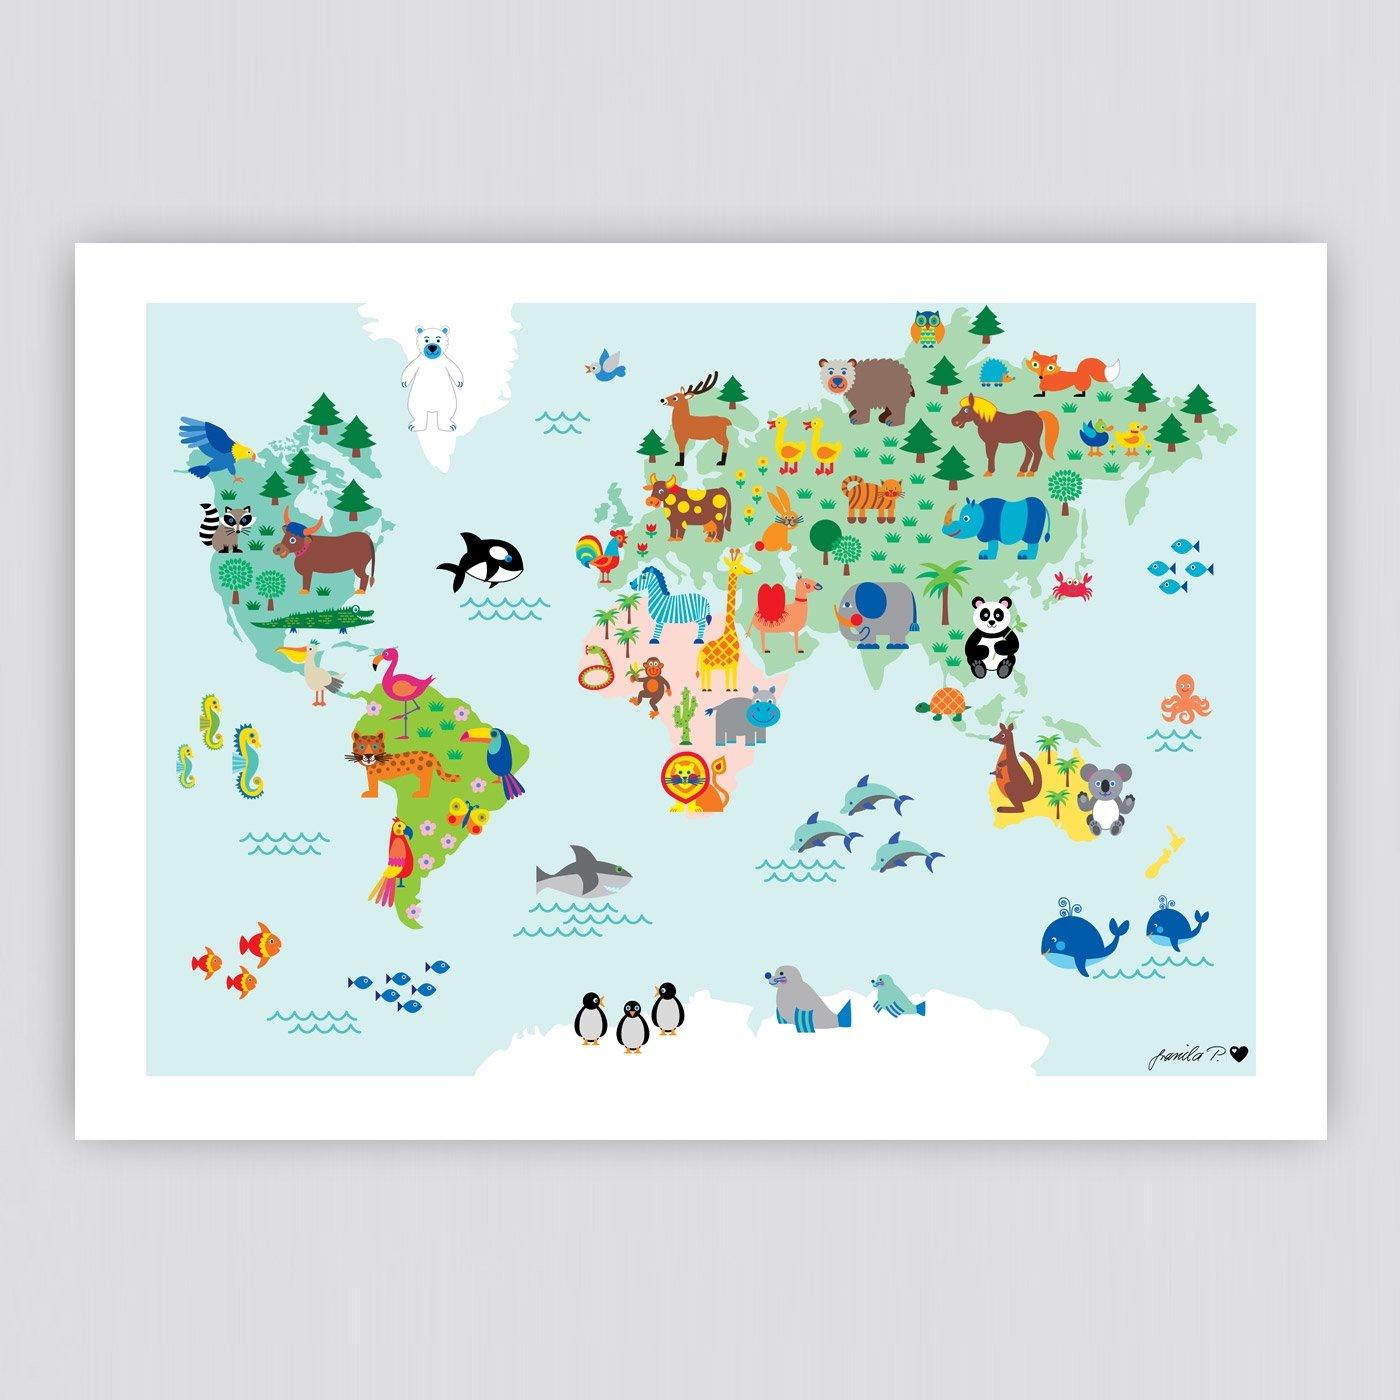 Illustrierte Weltkarte Tiere Tierweltkarte